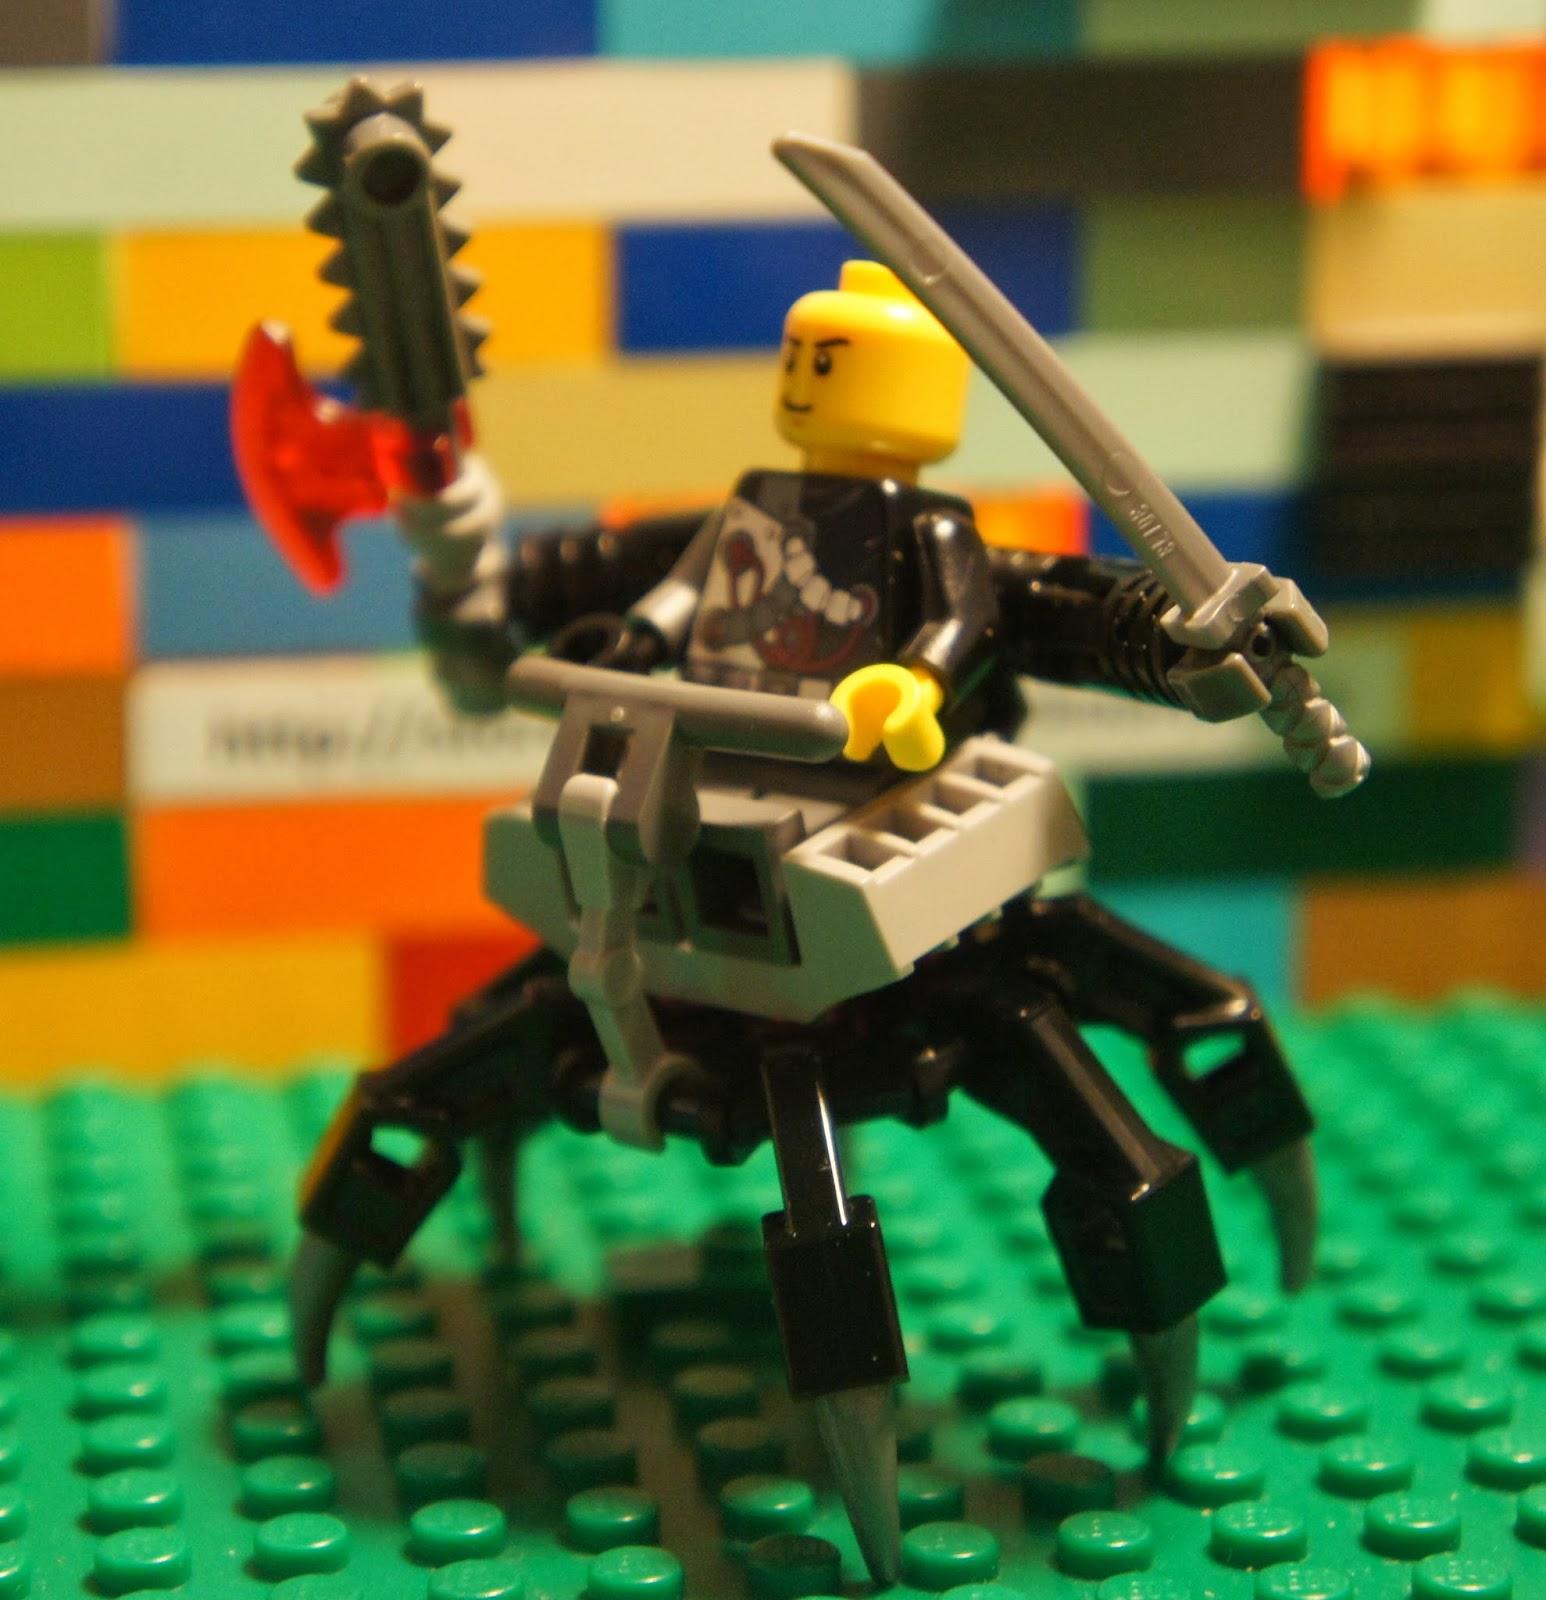 Lego Ninjago Nindroid Cyrus Borg Overborg Minifigure Mech